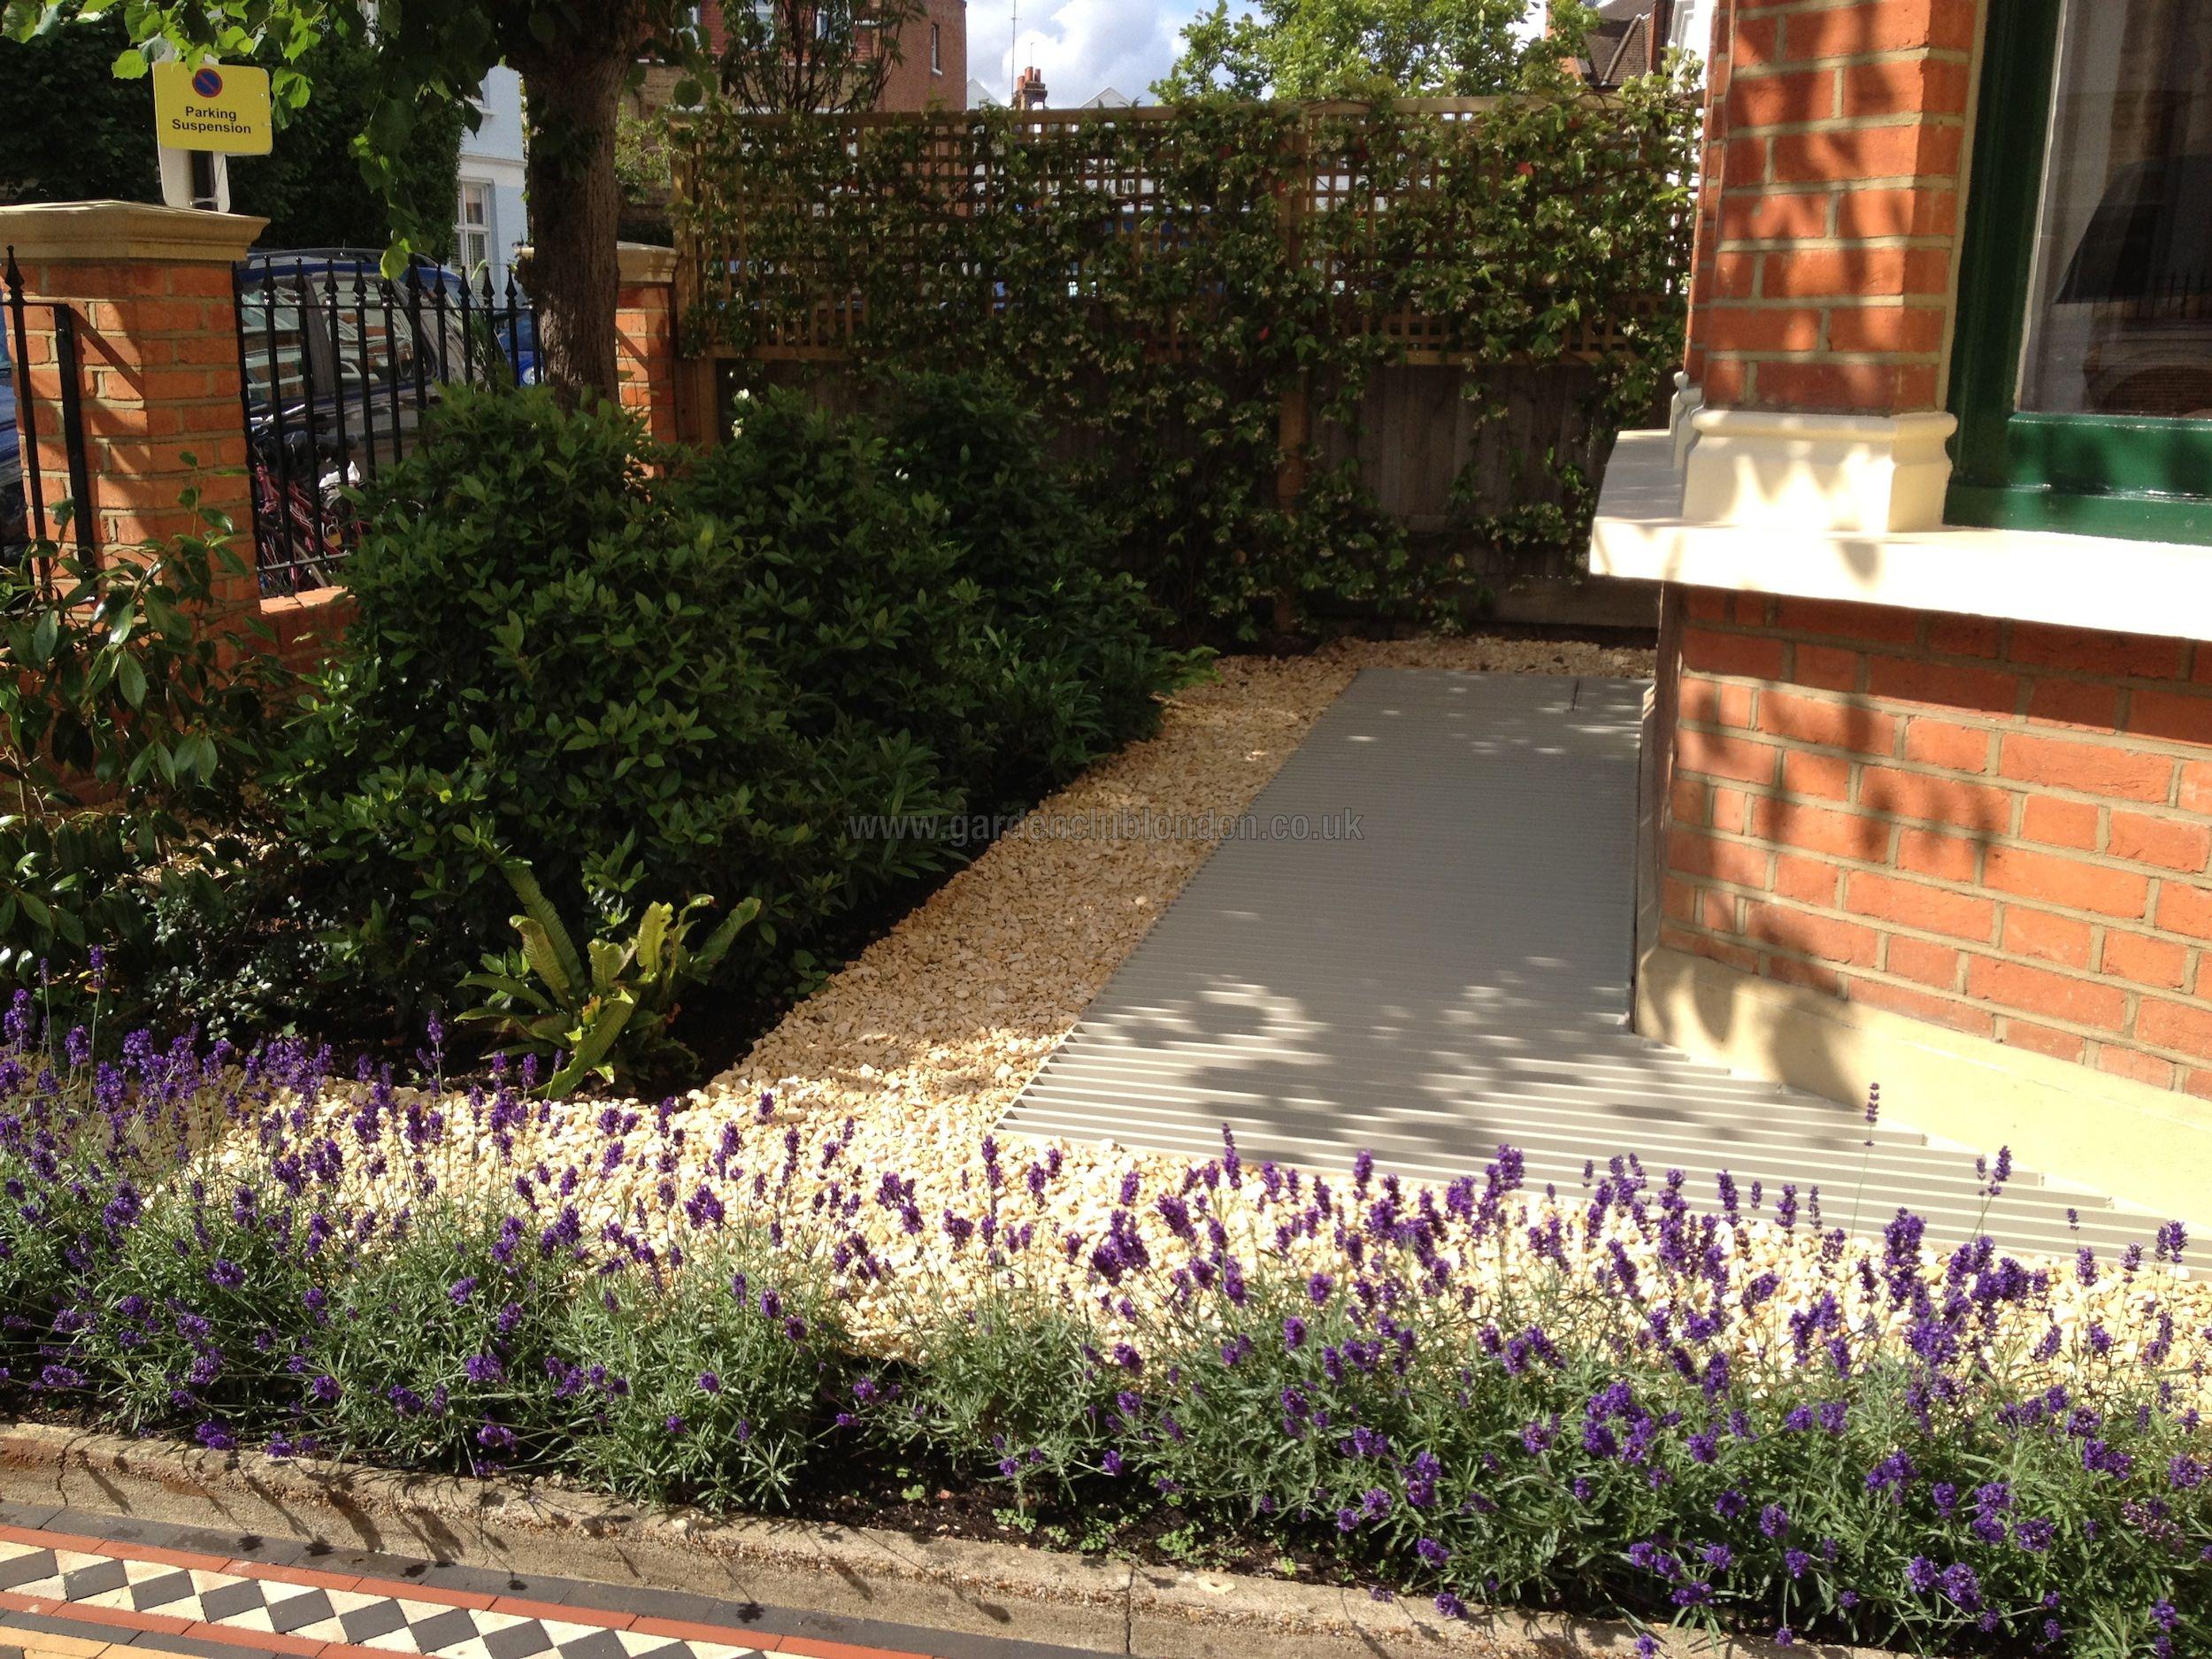 top 10 plants for london garden designs - garden club london